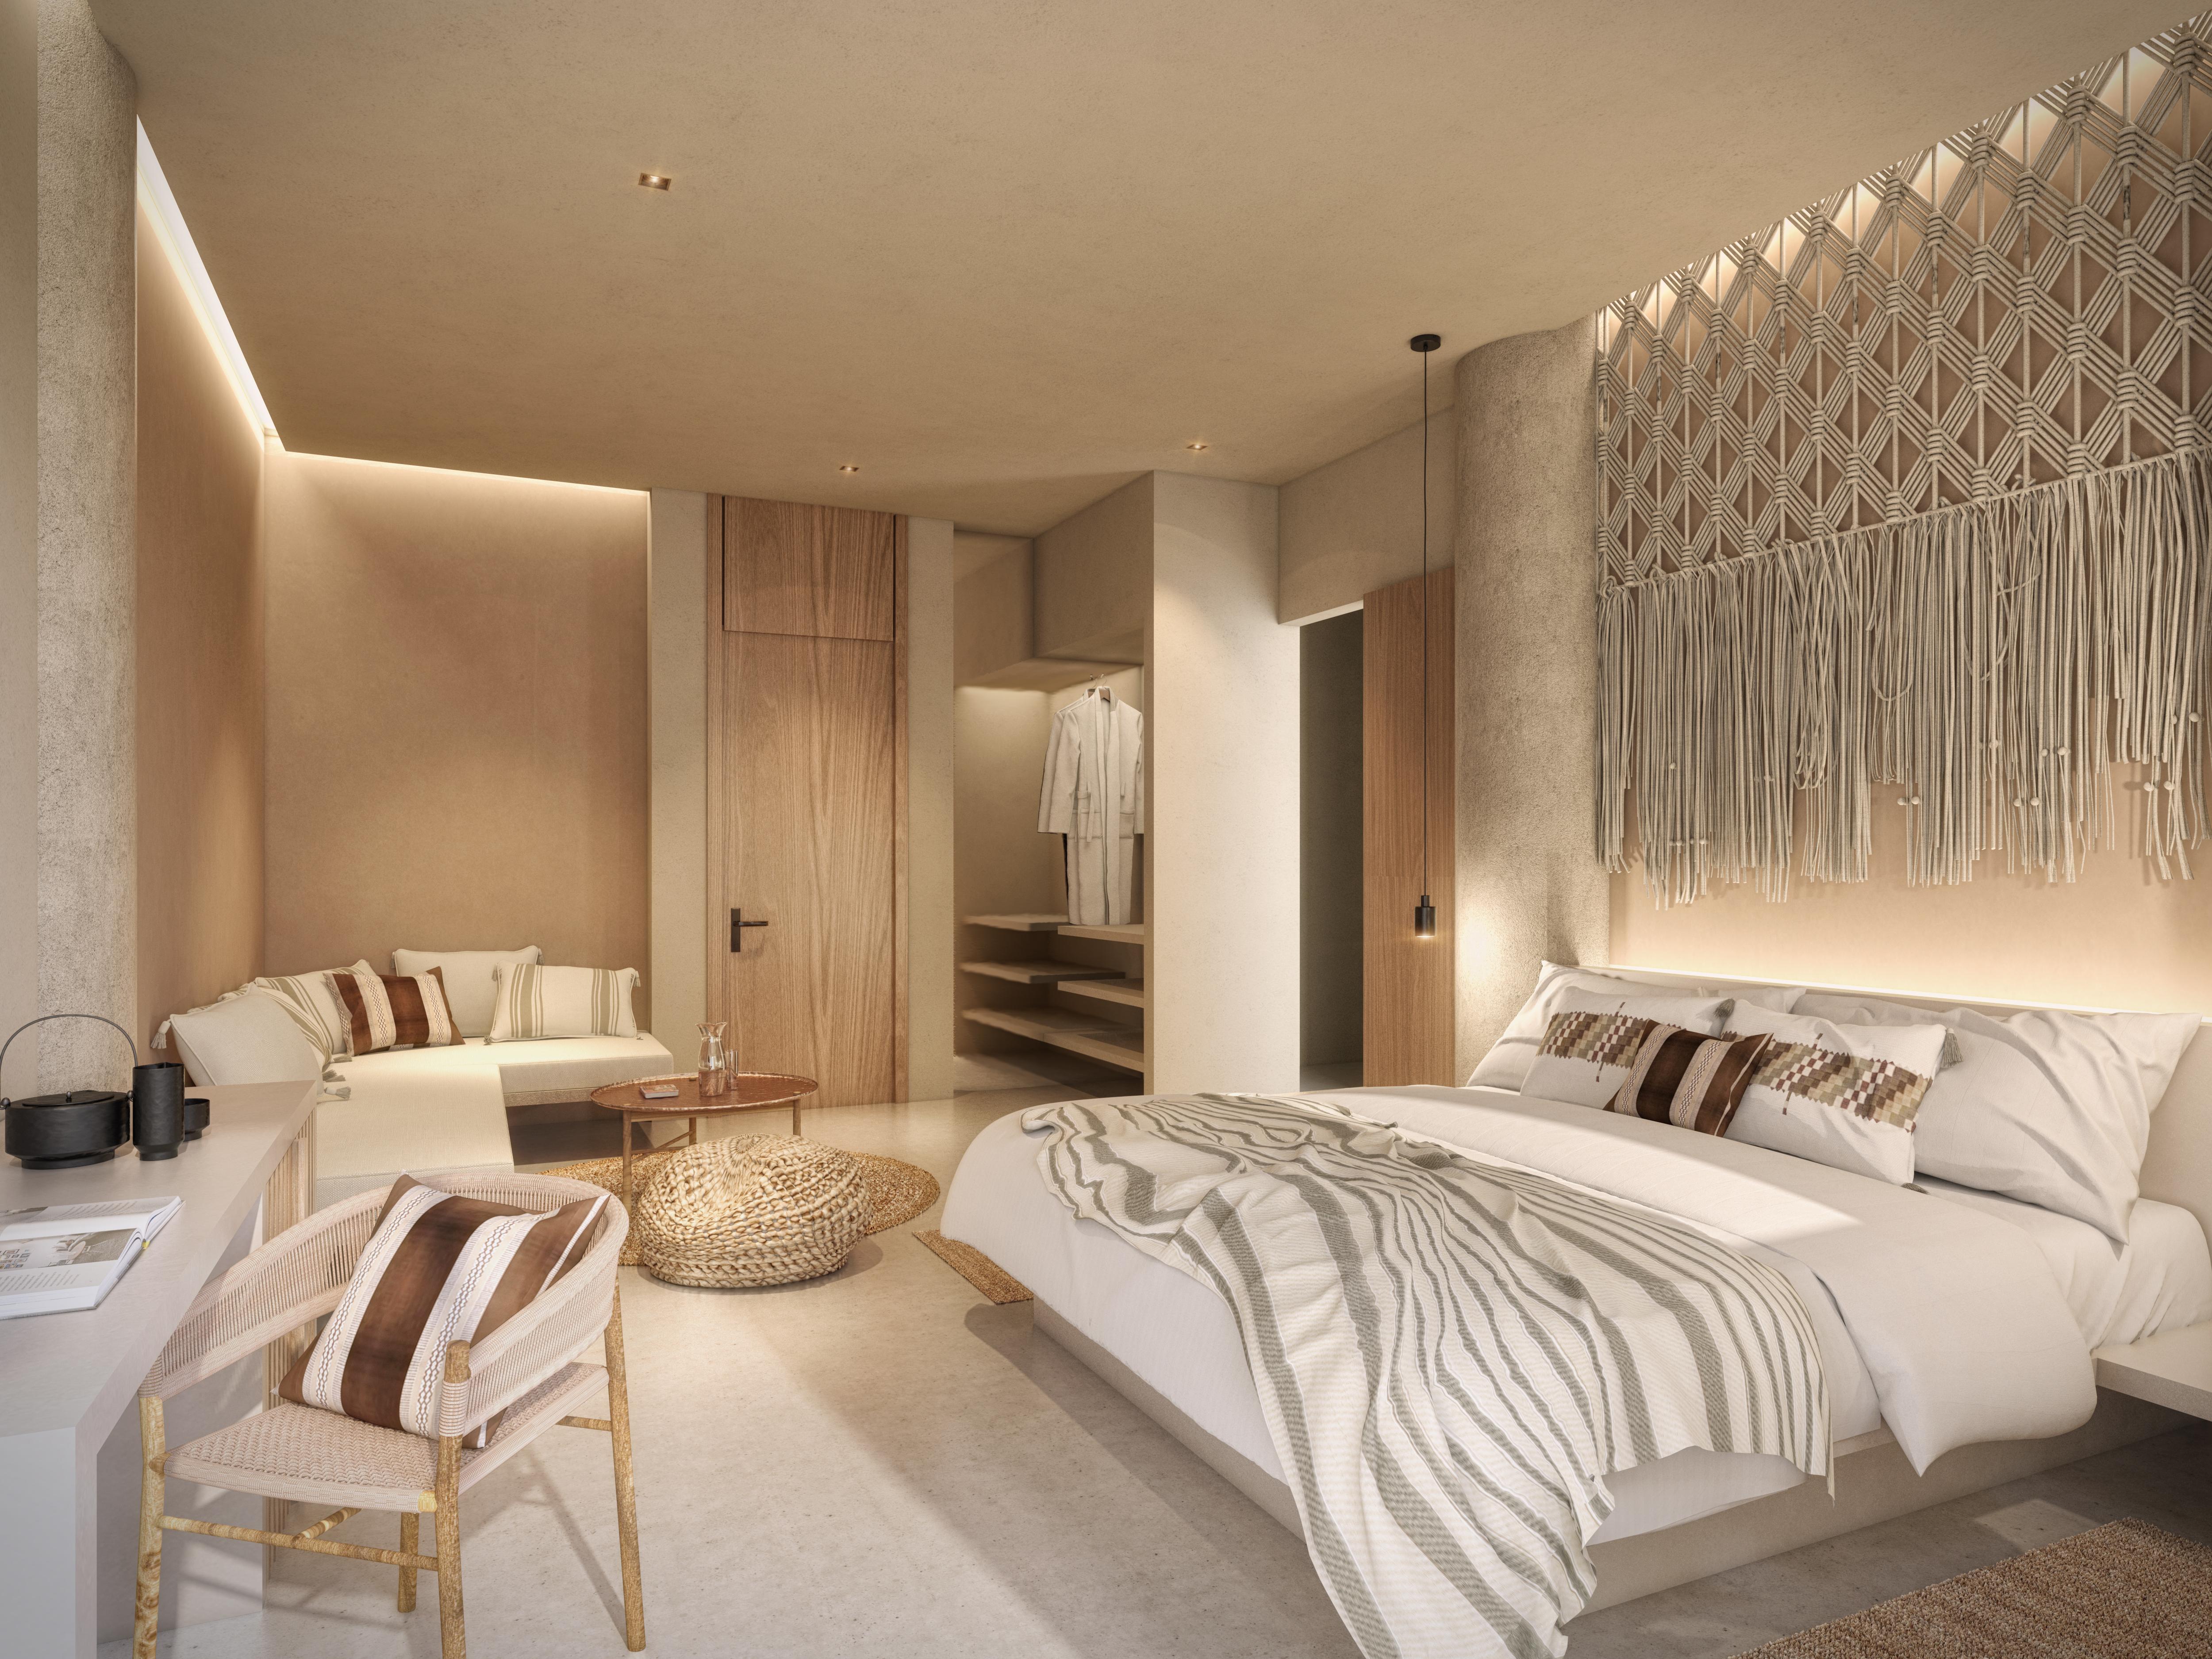 Amapa Room Render 1